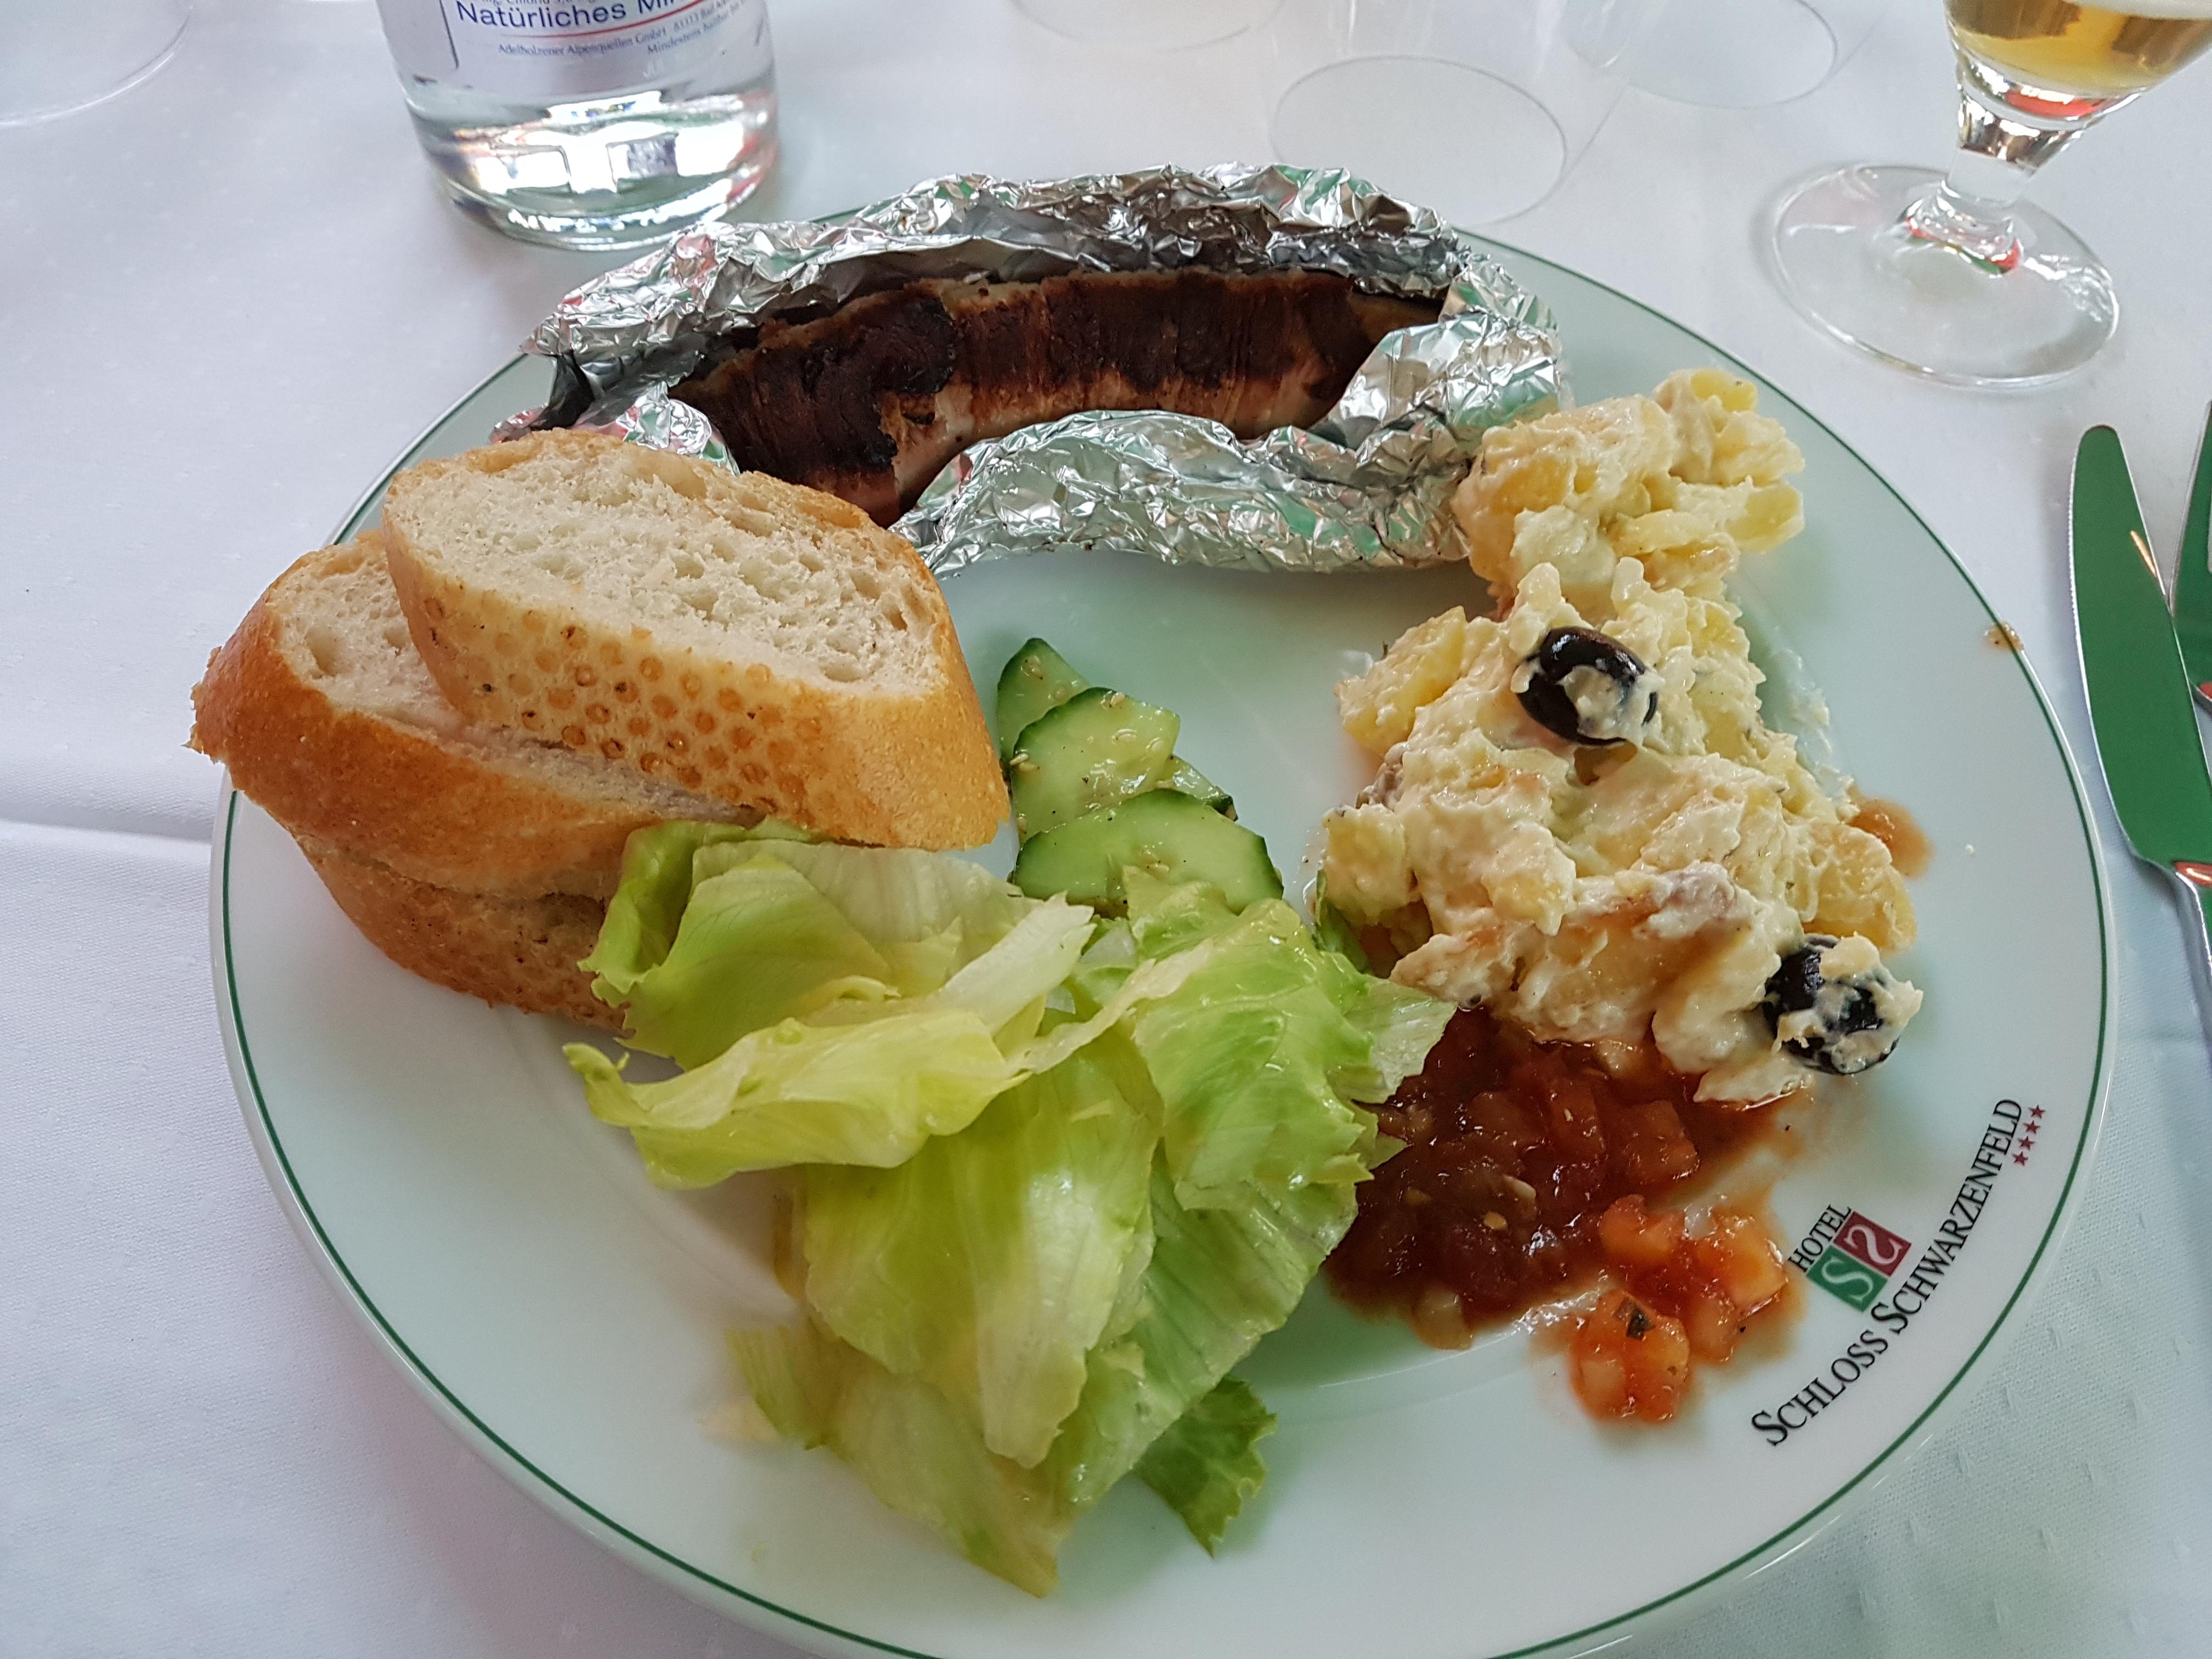 https://foodloader.net/Holz_2017-08-25_Bacon-Chili-Bratwurst_mit_Kartoffelsalat.jpg